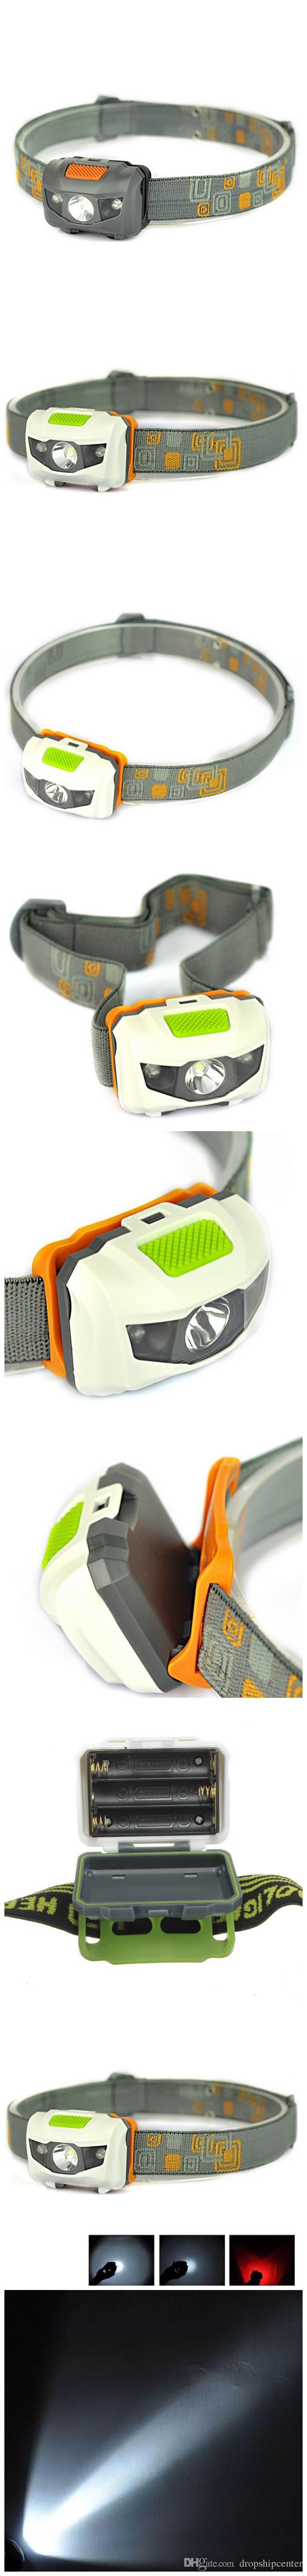 Mini Portable Phare 600LM Phare Cree R3 Phares 2 LED Lampe de Poche Phares Torche Lanterna Avec Bandeau Randonnée Camping